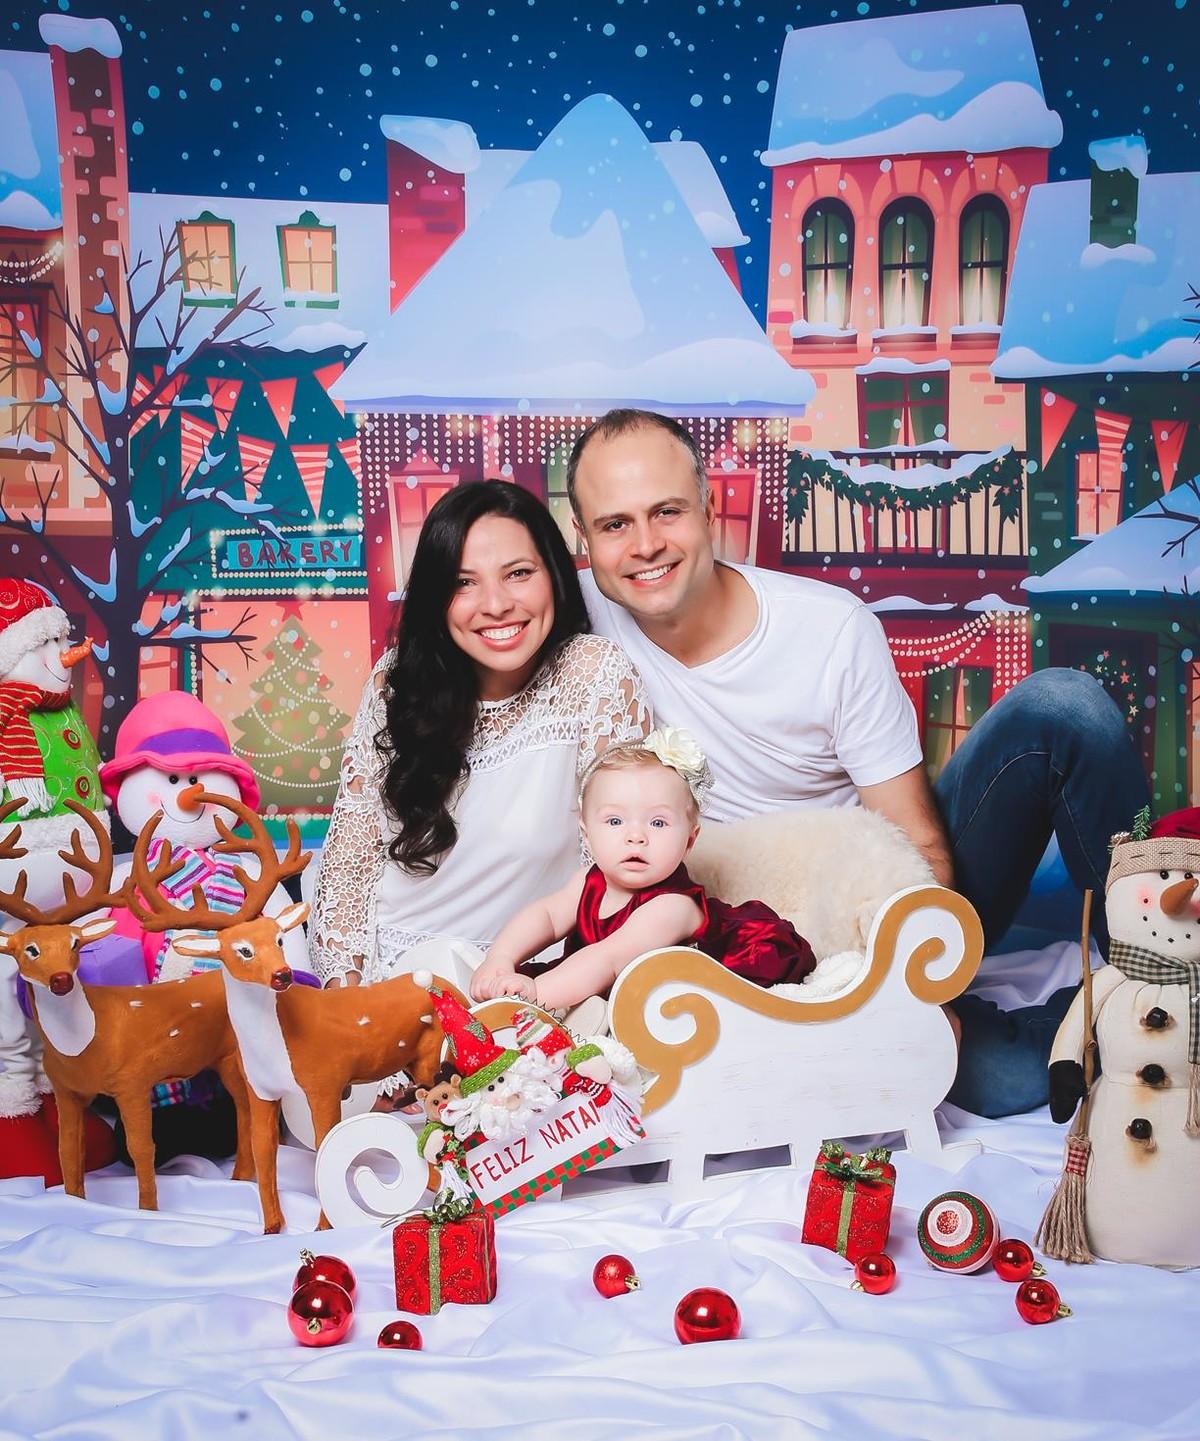 Fotos lindas de Natal Familia